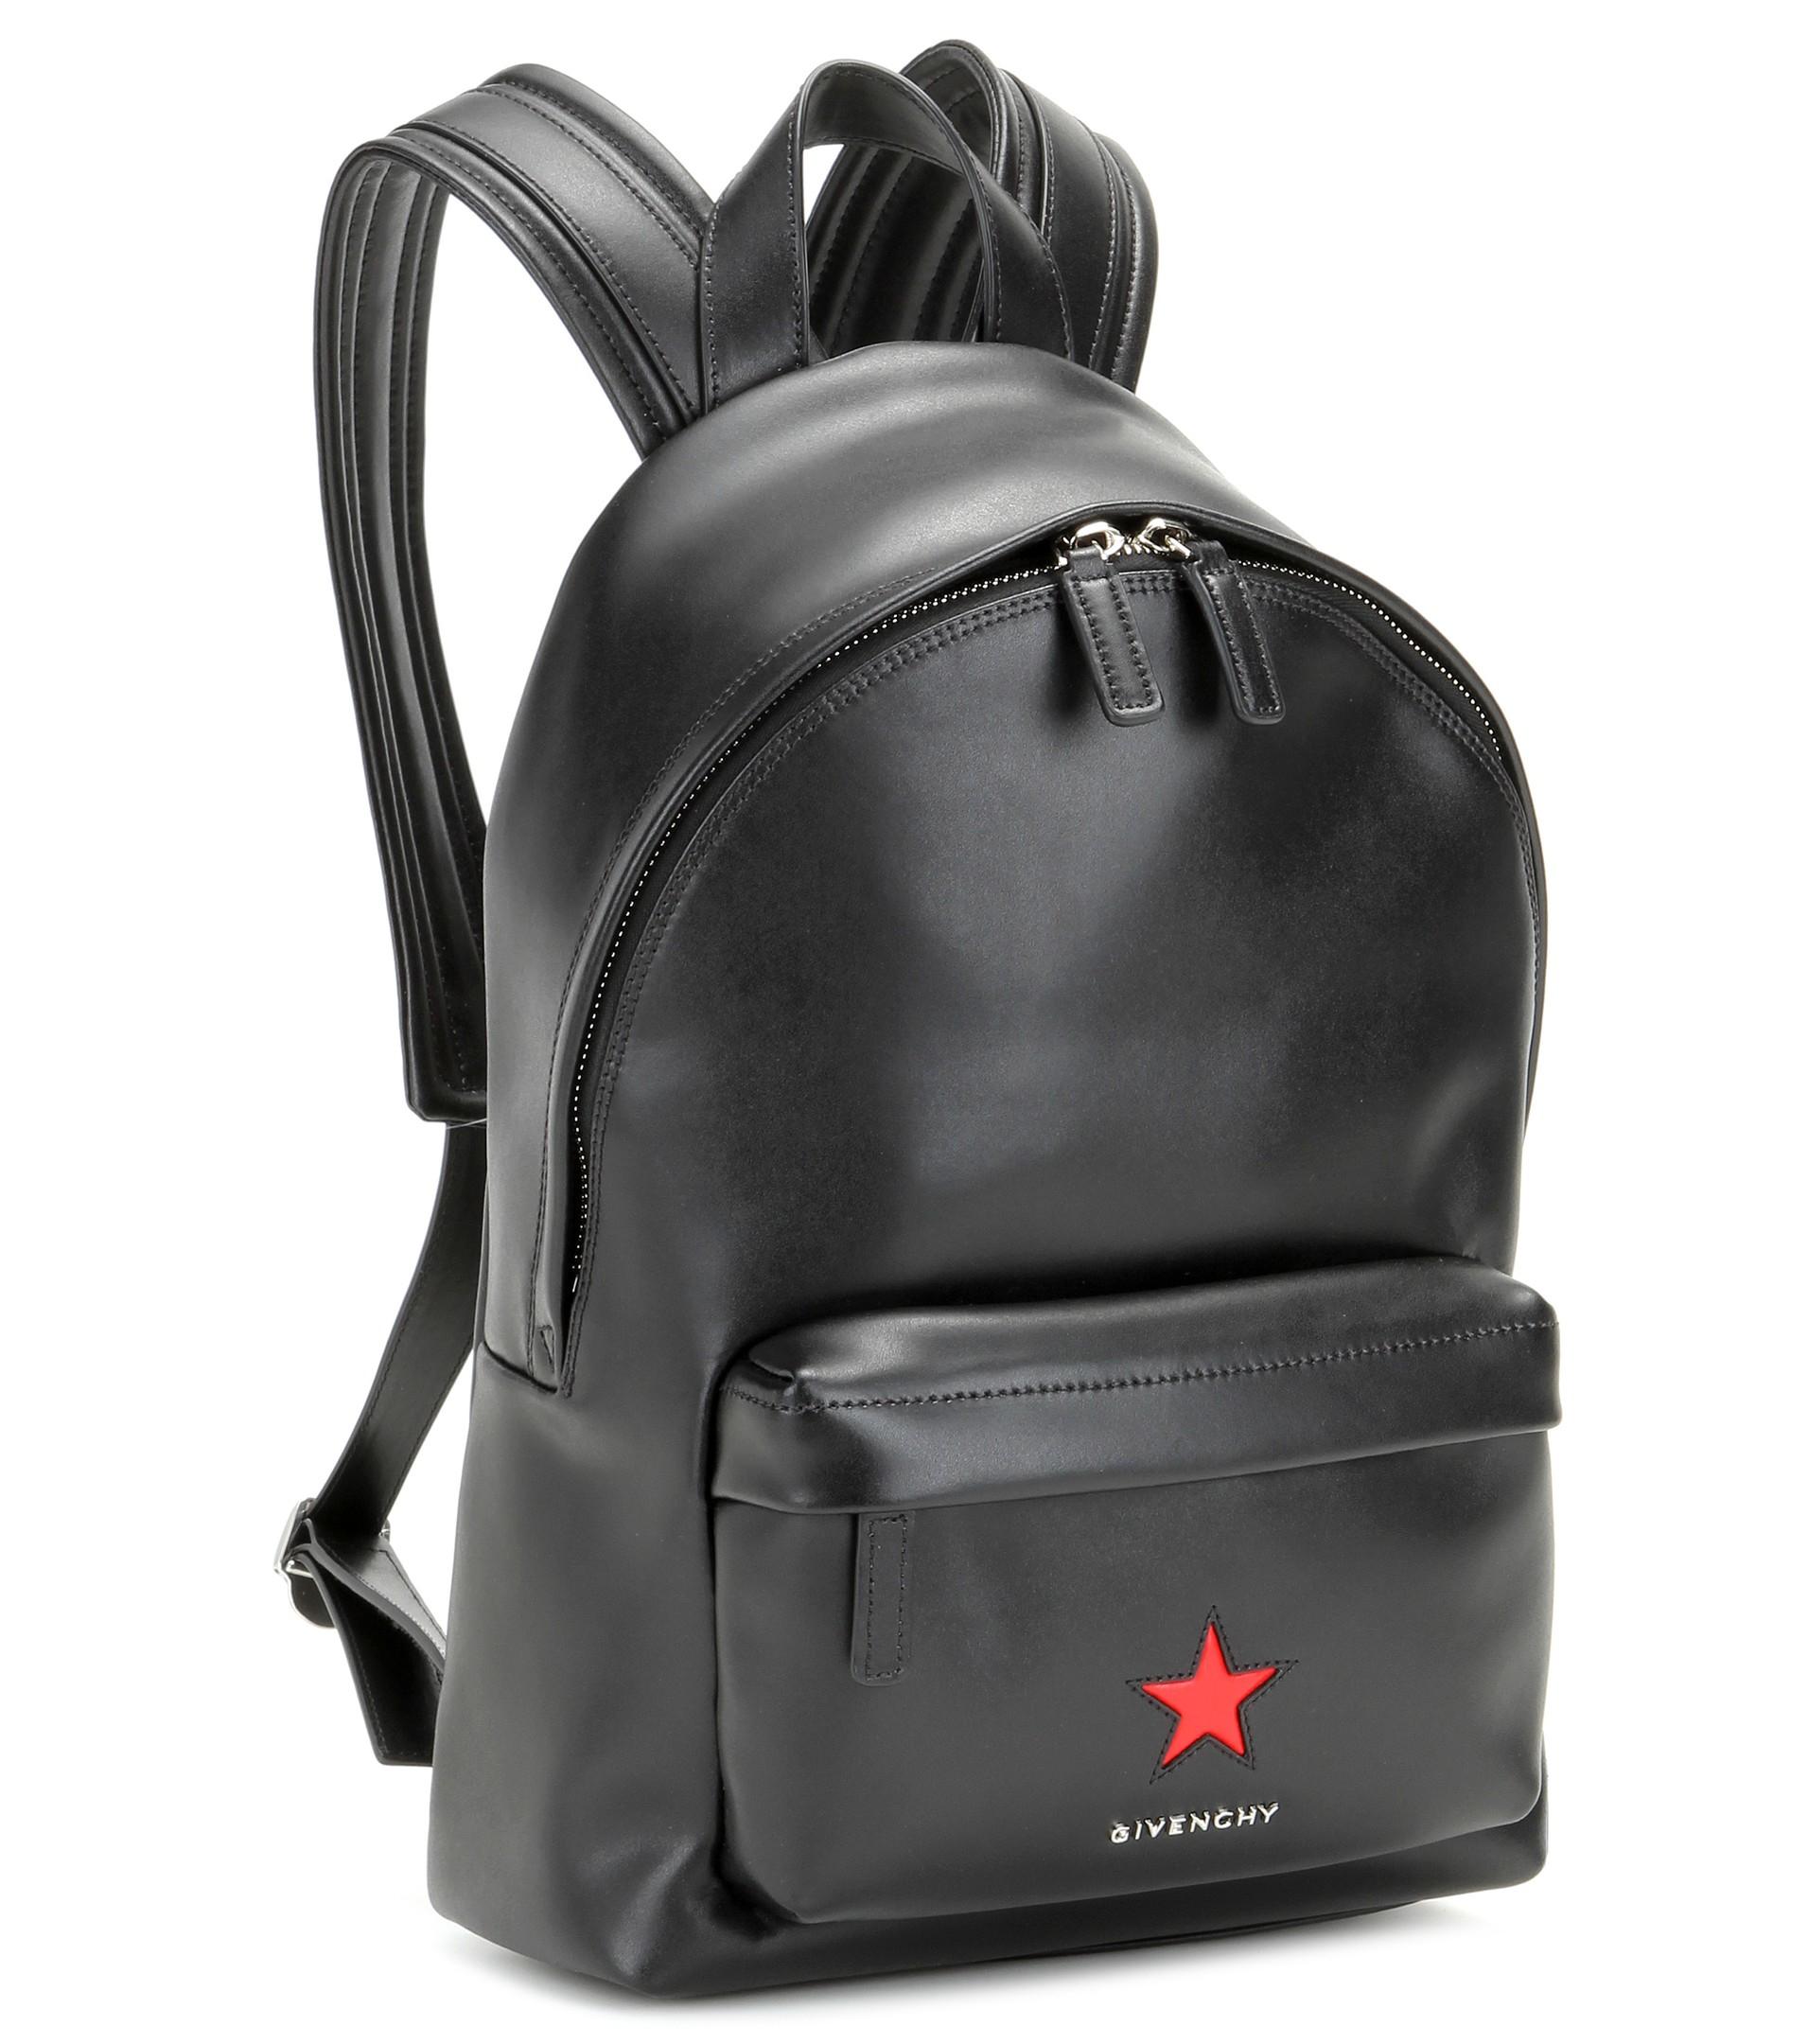 4bcfeae564d5 Givenchy Backpack Black